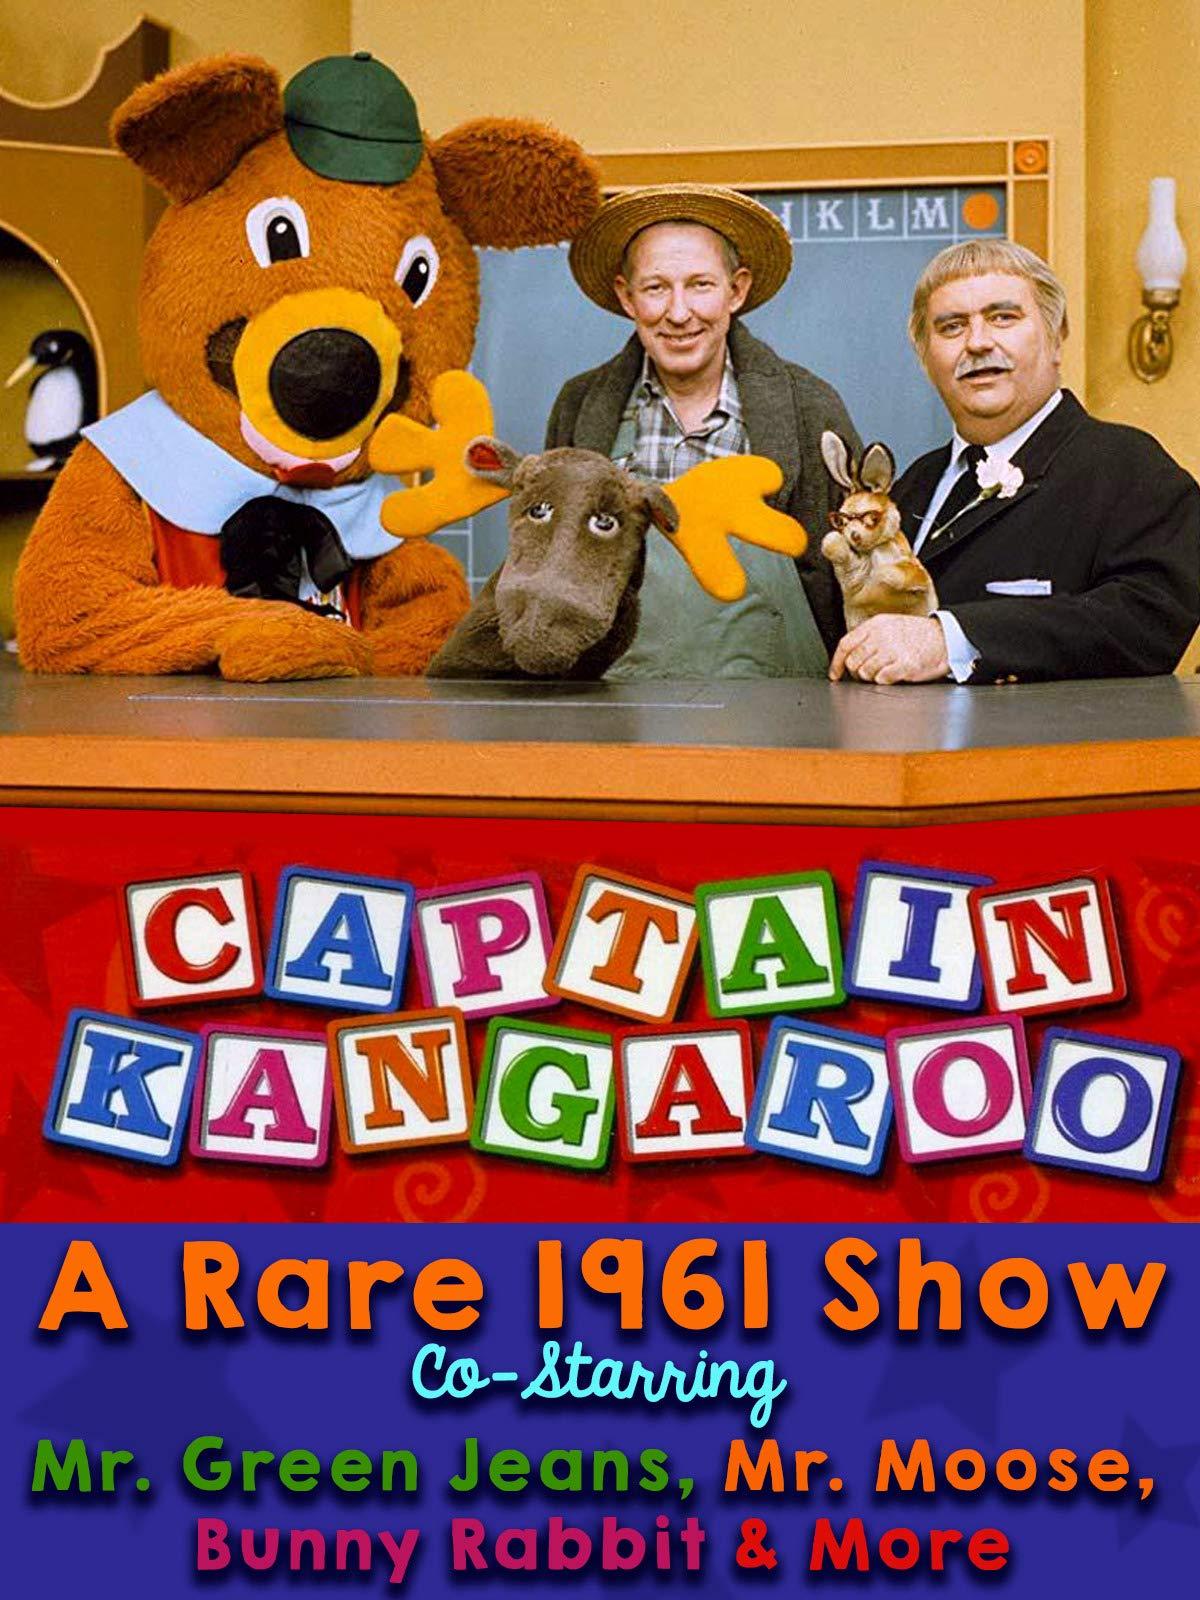 Captain Kangaroo - A Rare 1961 Show, Co-Starring Mr. Green Jeans, Mr. Moose, Bunny Rabbit & More